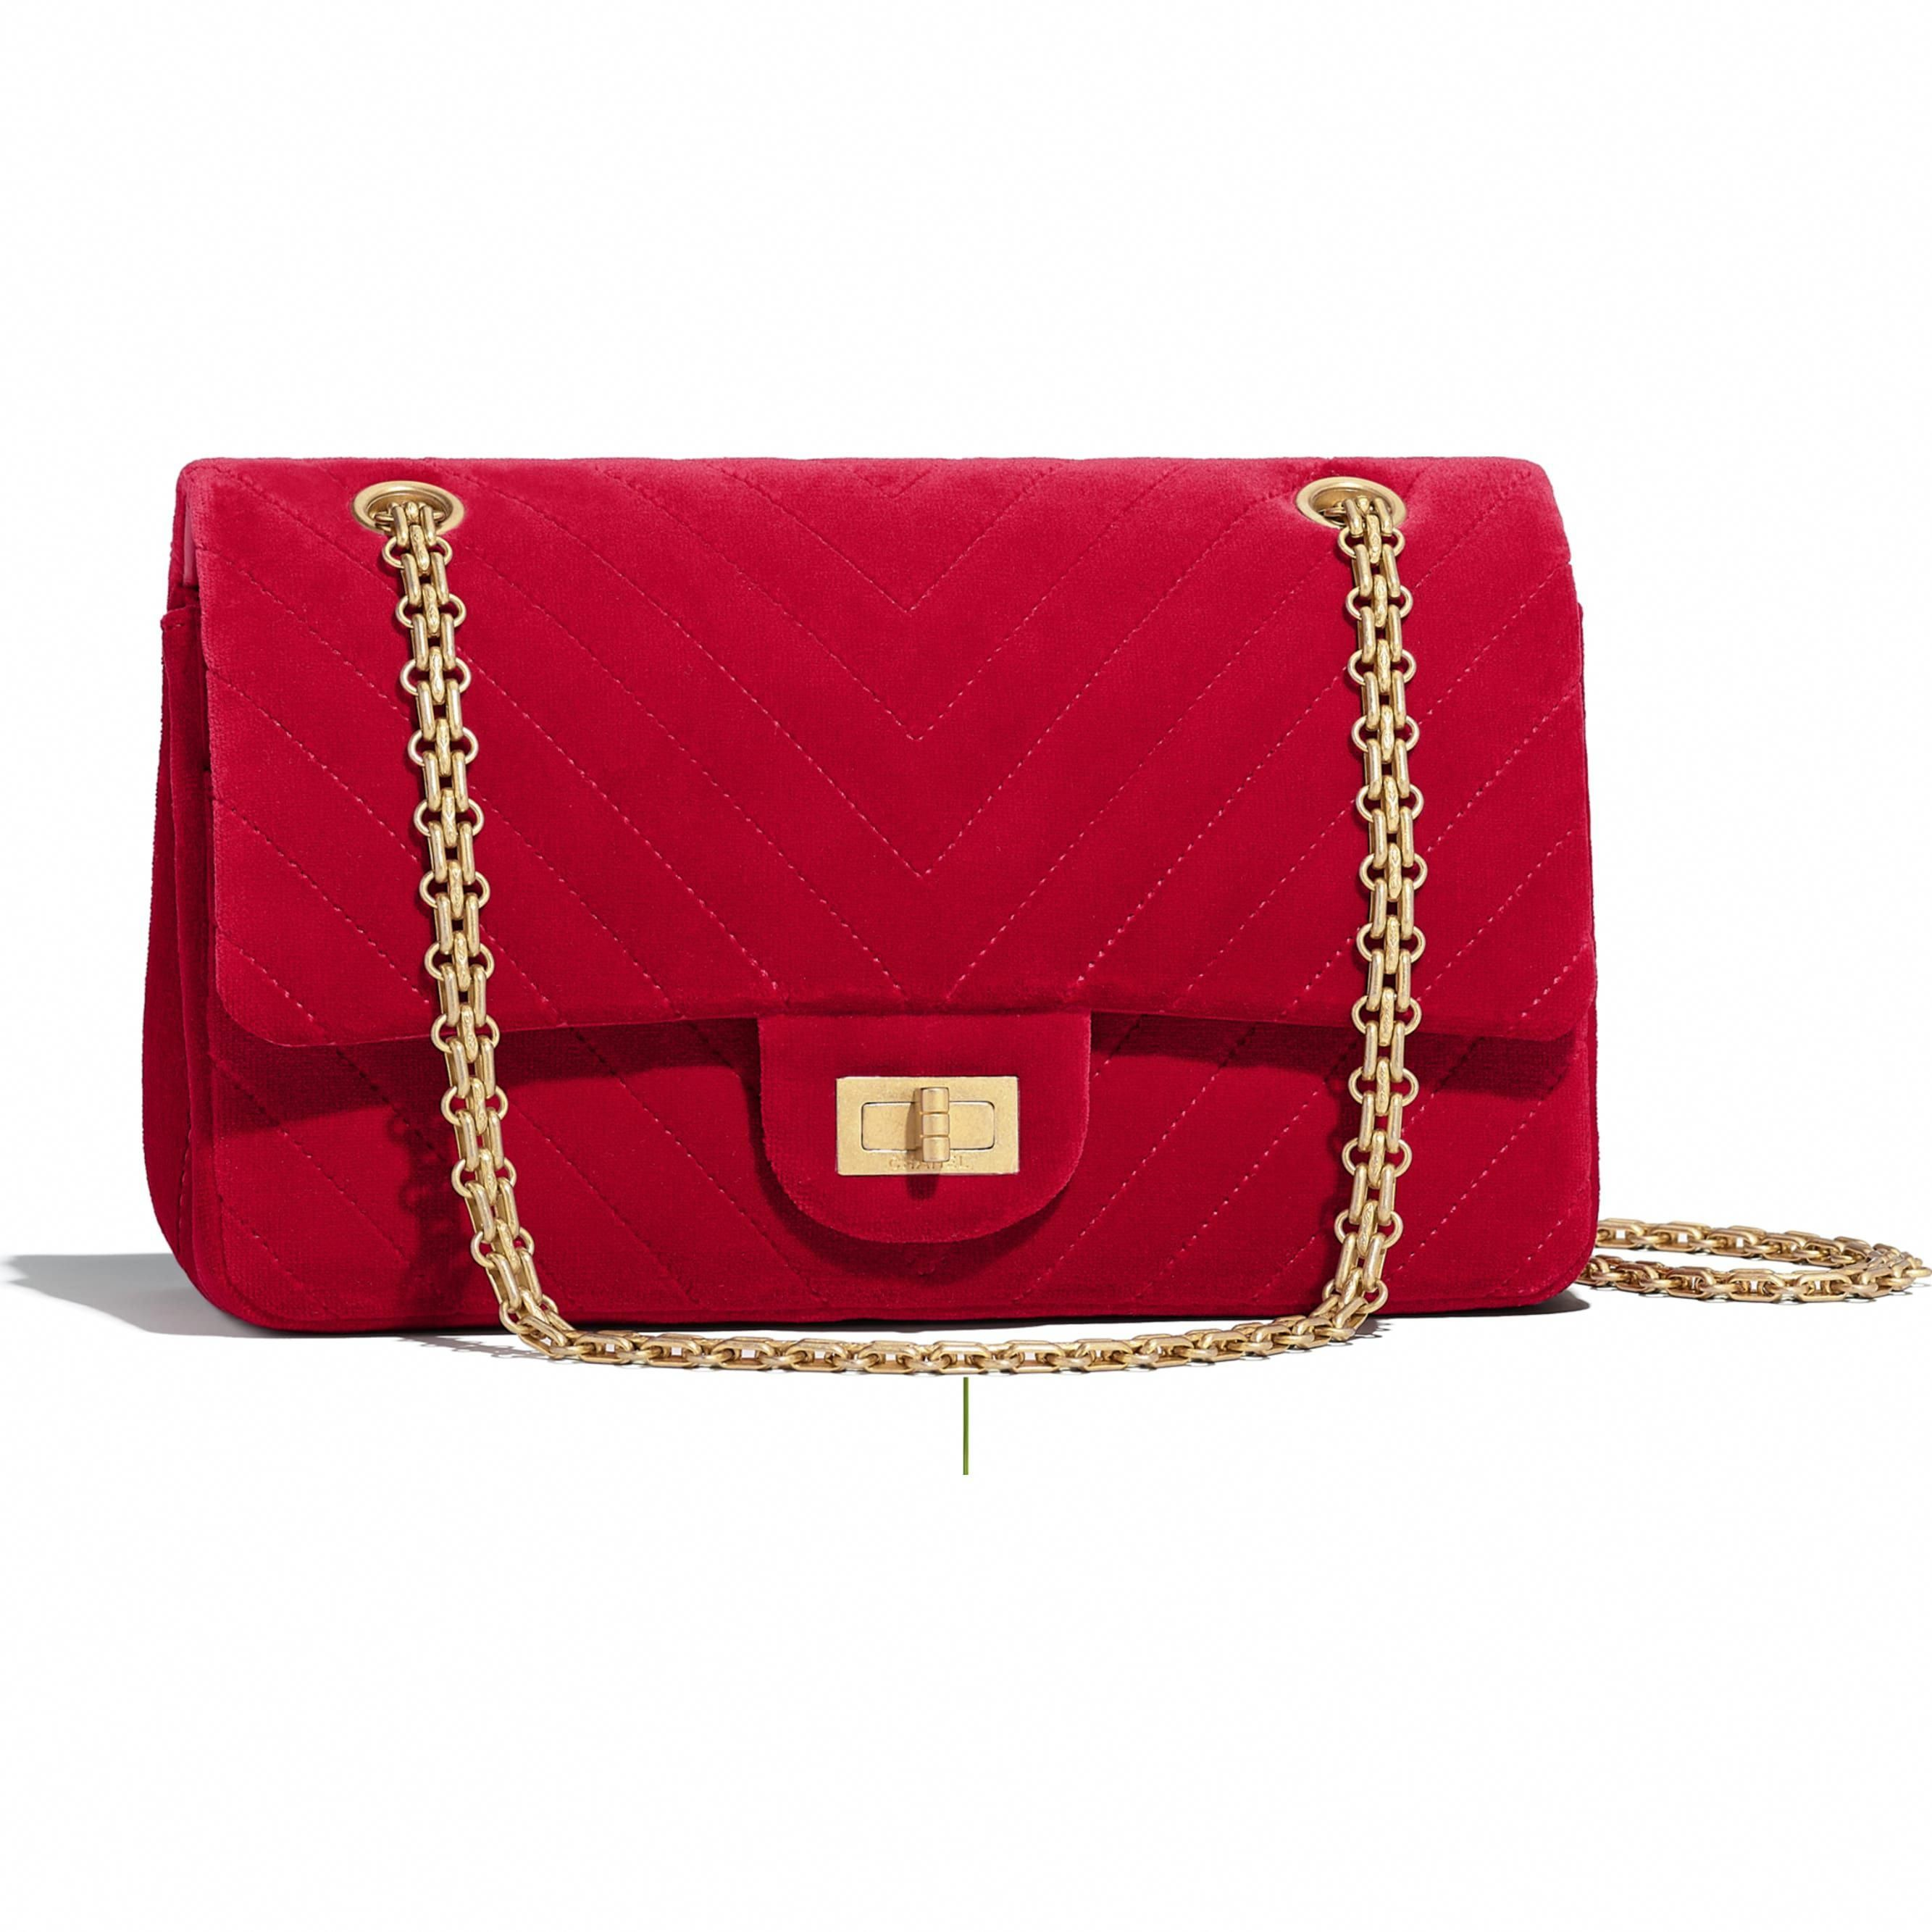 b37117cdf62d chanel handbags bloomingdaleschanel handbags on clearance  Chanelhandbags